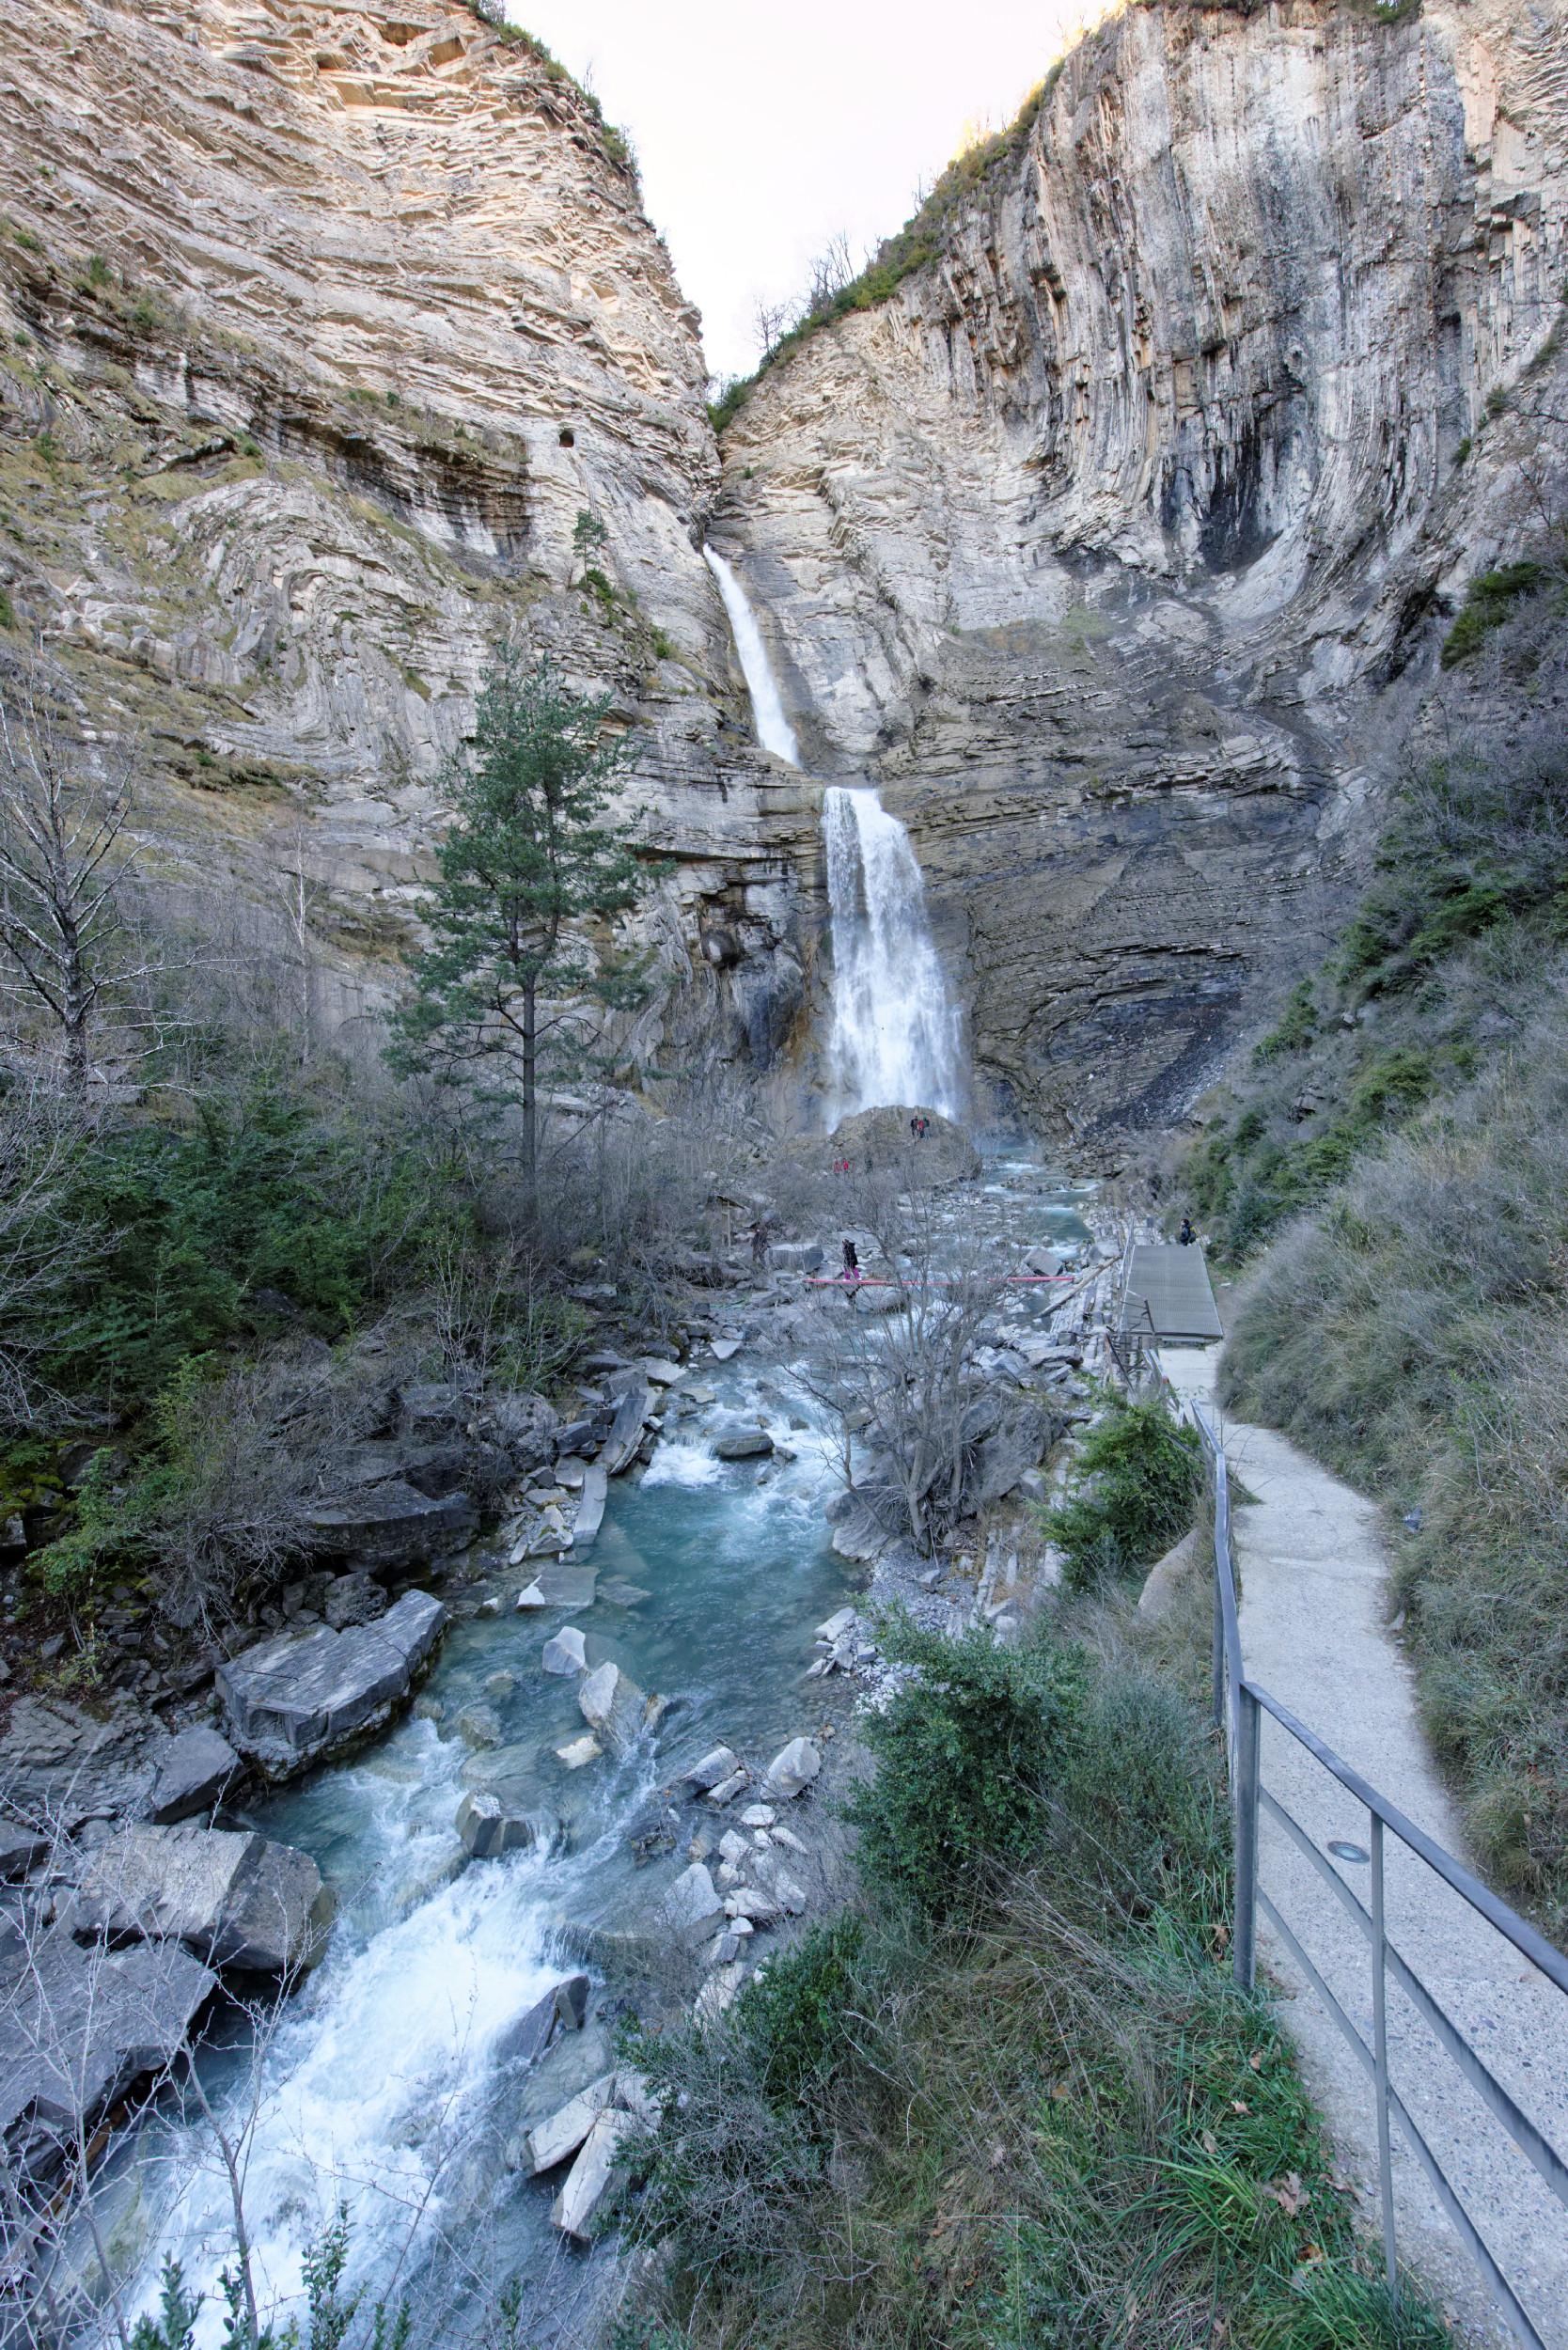 141207-Broto cascade de  Sorrosal (Sobrarbe) (16)